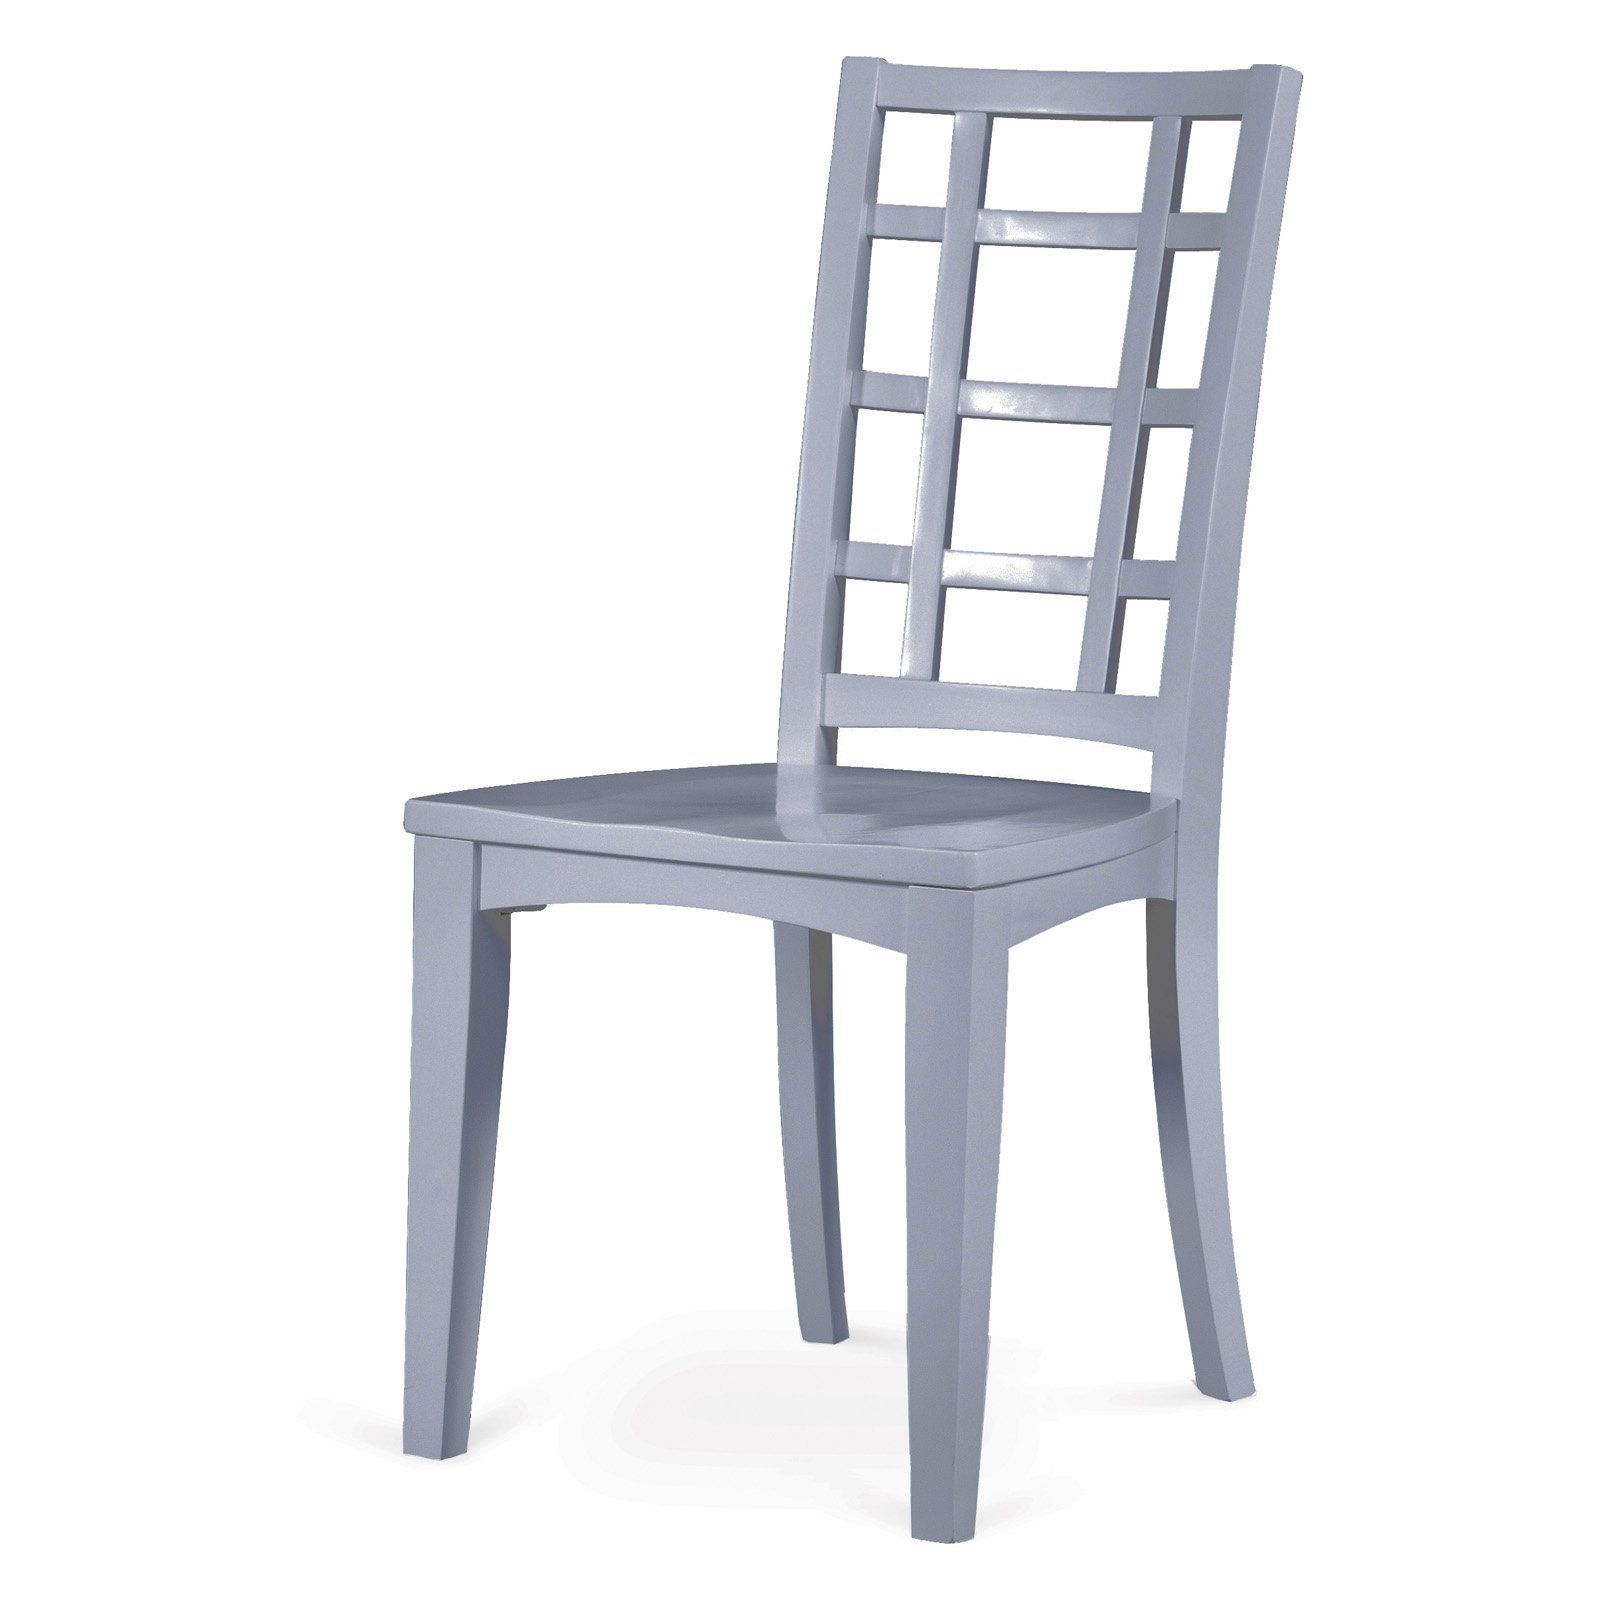 Magnussen Graylyn Youth Desk Chair  Y3572 85